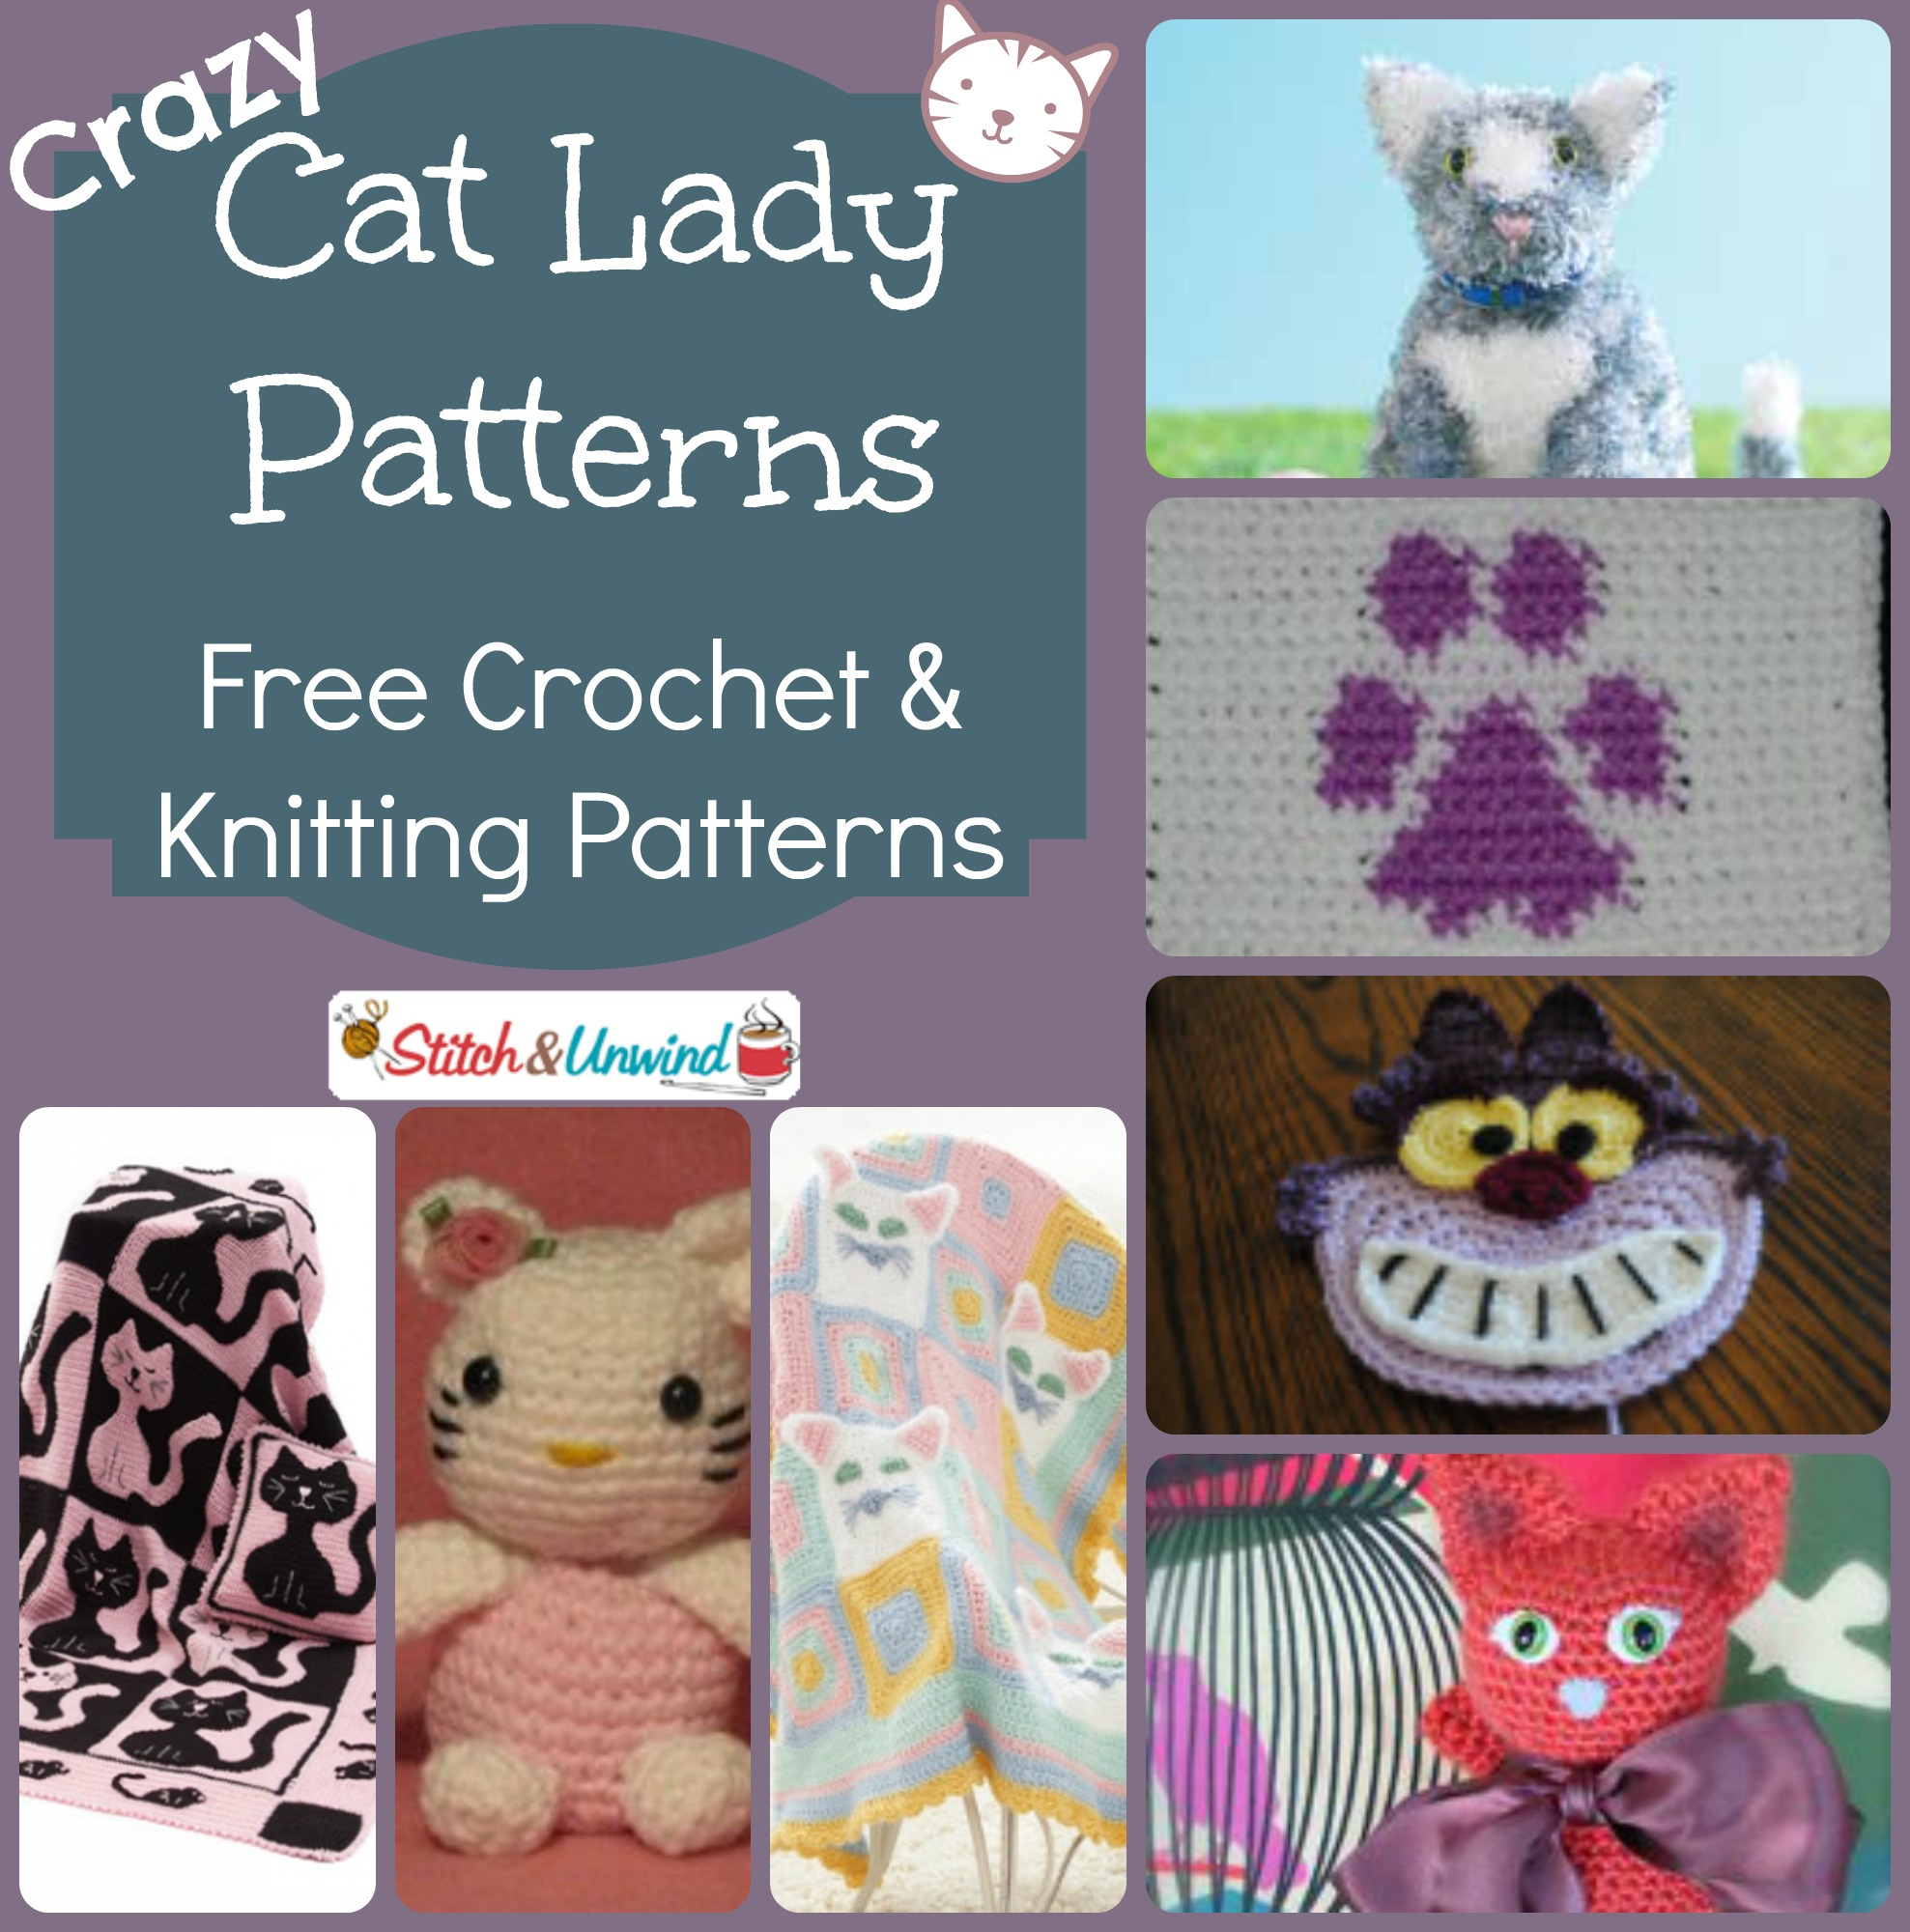 Crazy Cat Lady Patterns Free Crochet Knitting Patterns Stitch